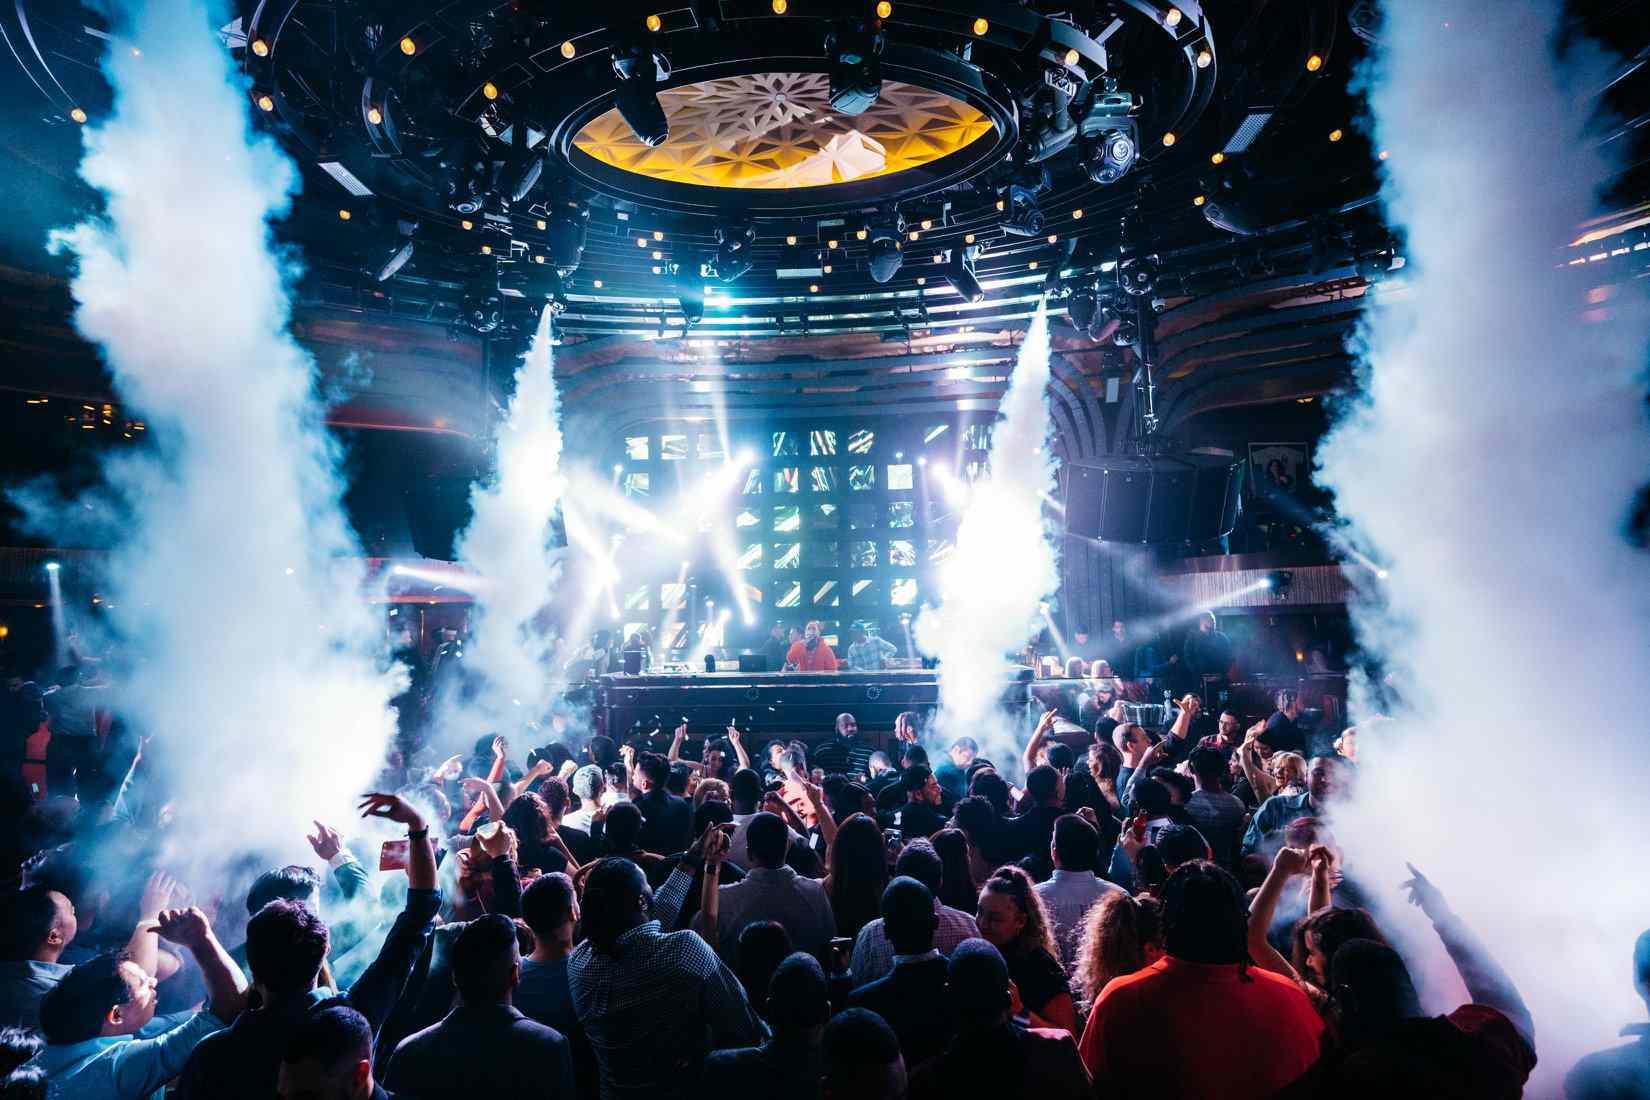 Crowd in Jewel nightclub with smoke machines and a light show